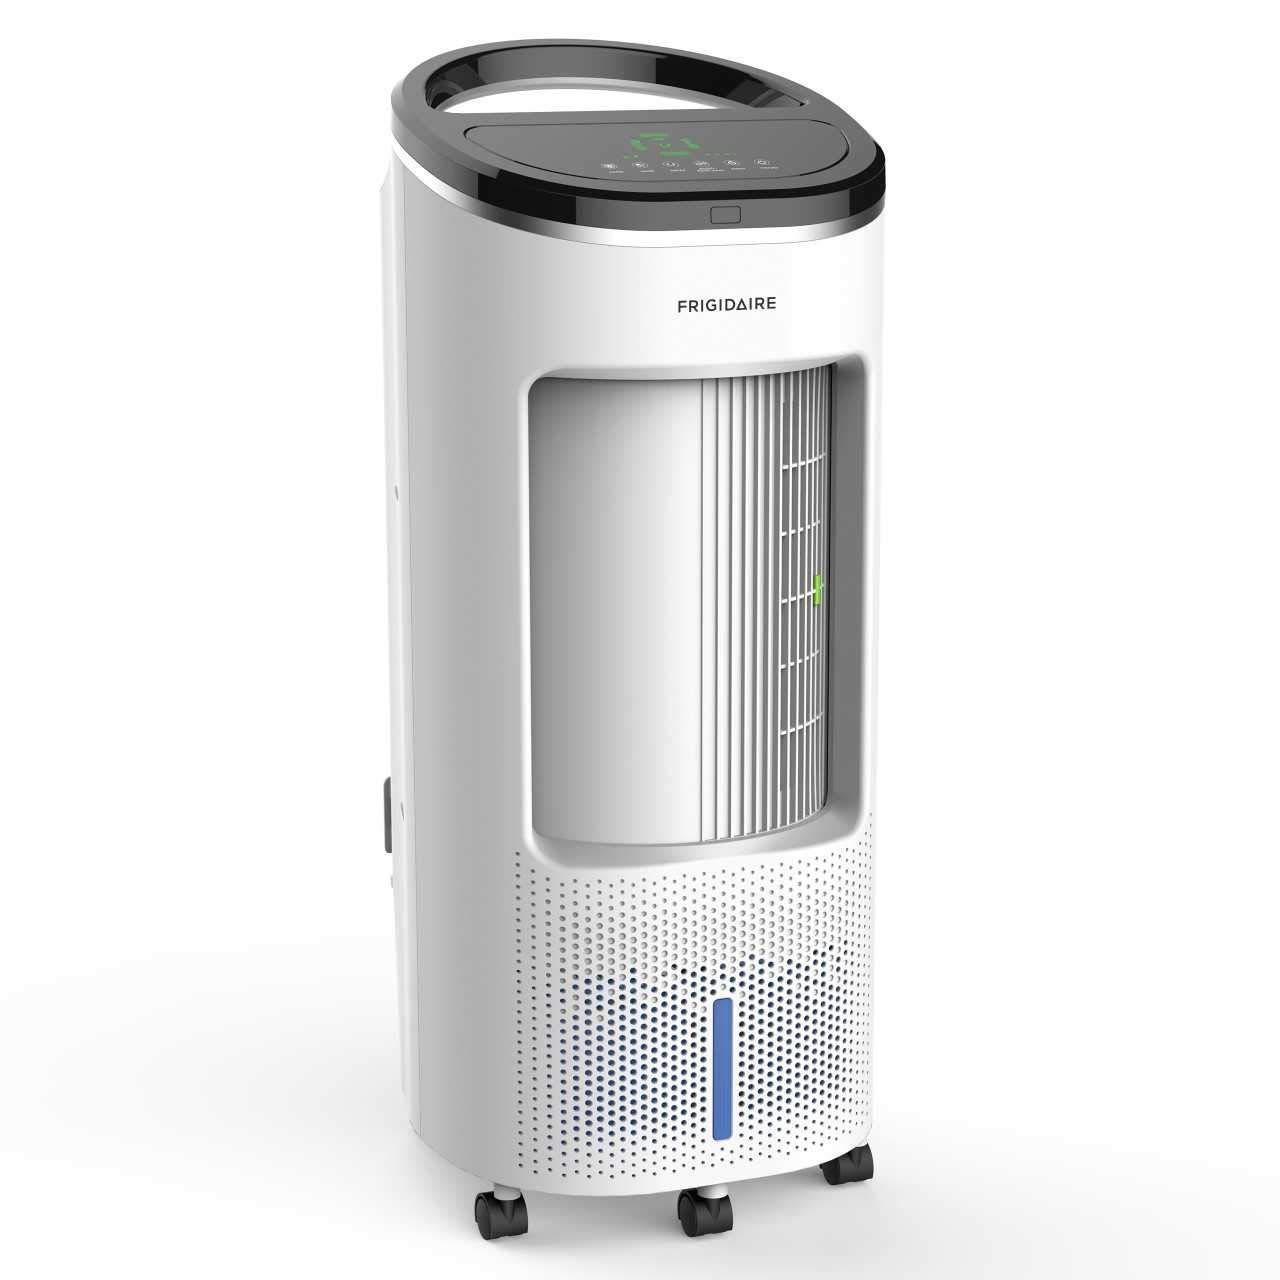 Frigidaire EC200WF Portable Evaporative Humidifier